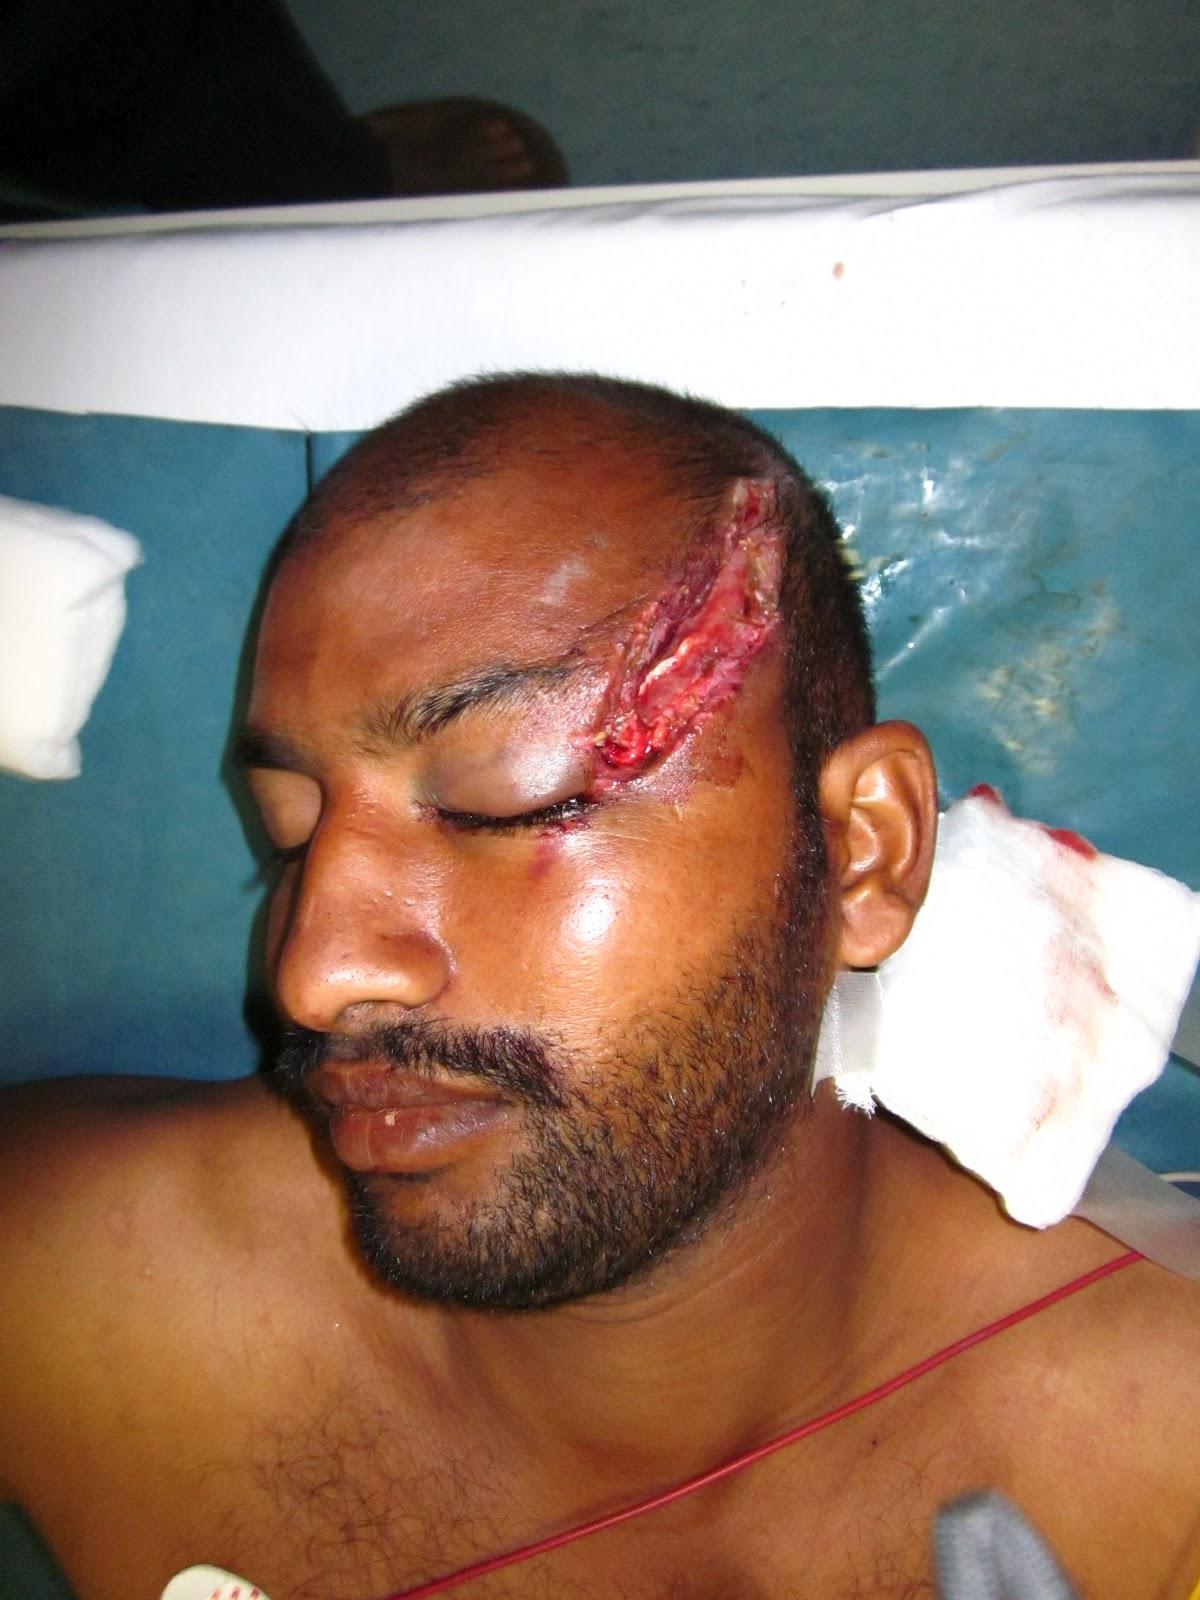 Gross Injuries | www.imgkid.com - The Image Kid Has It!